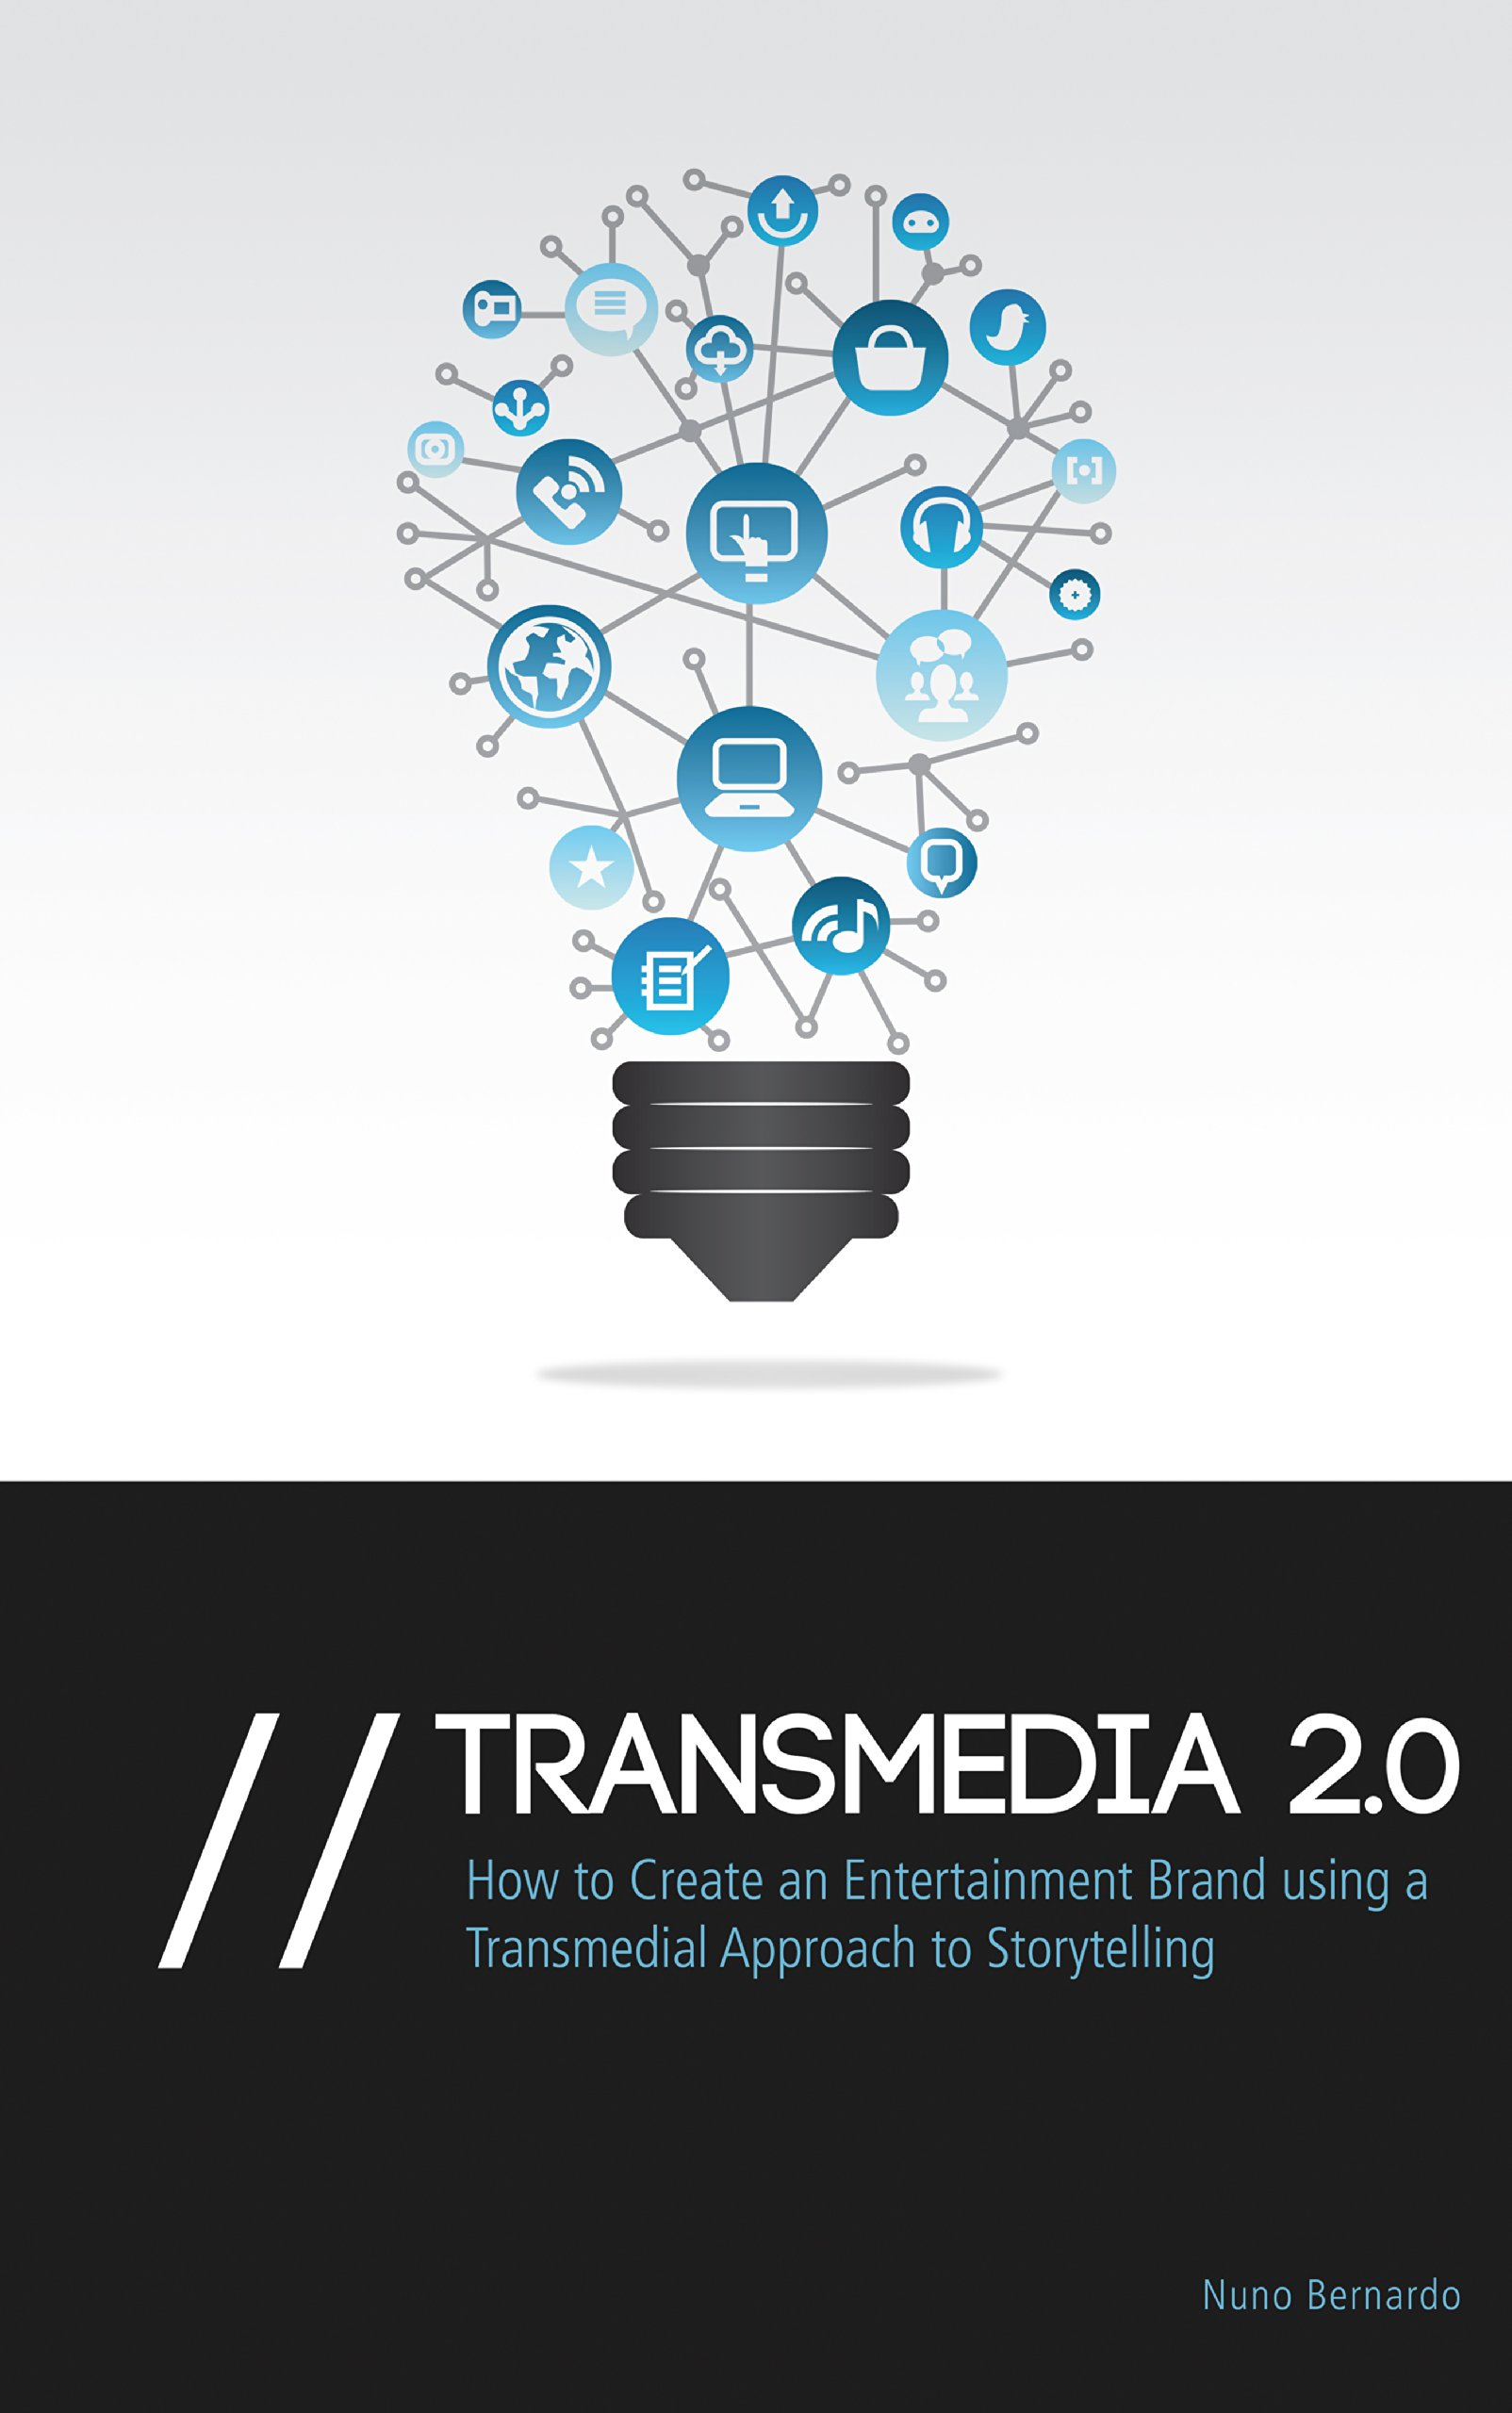 transmedia_2-0